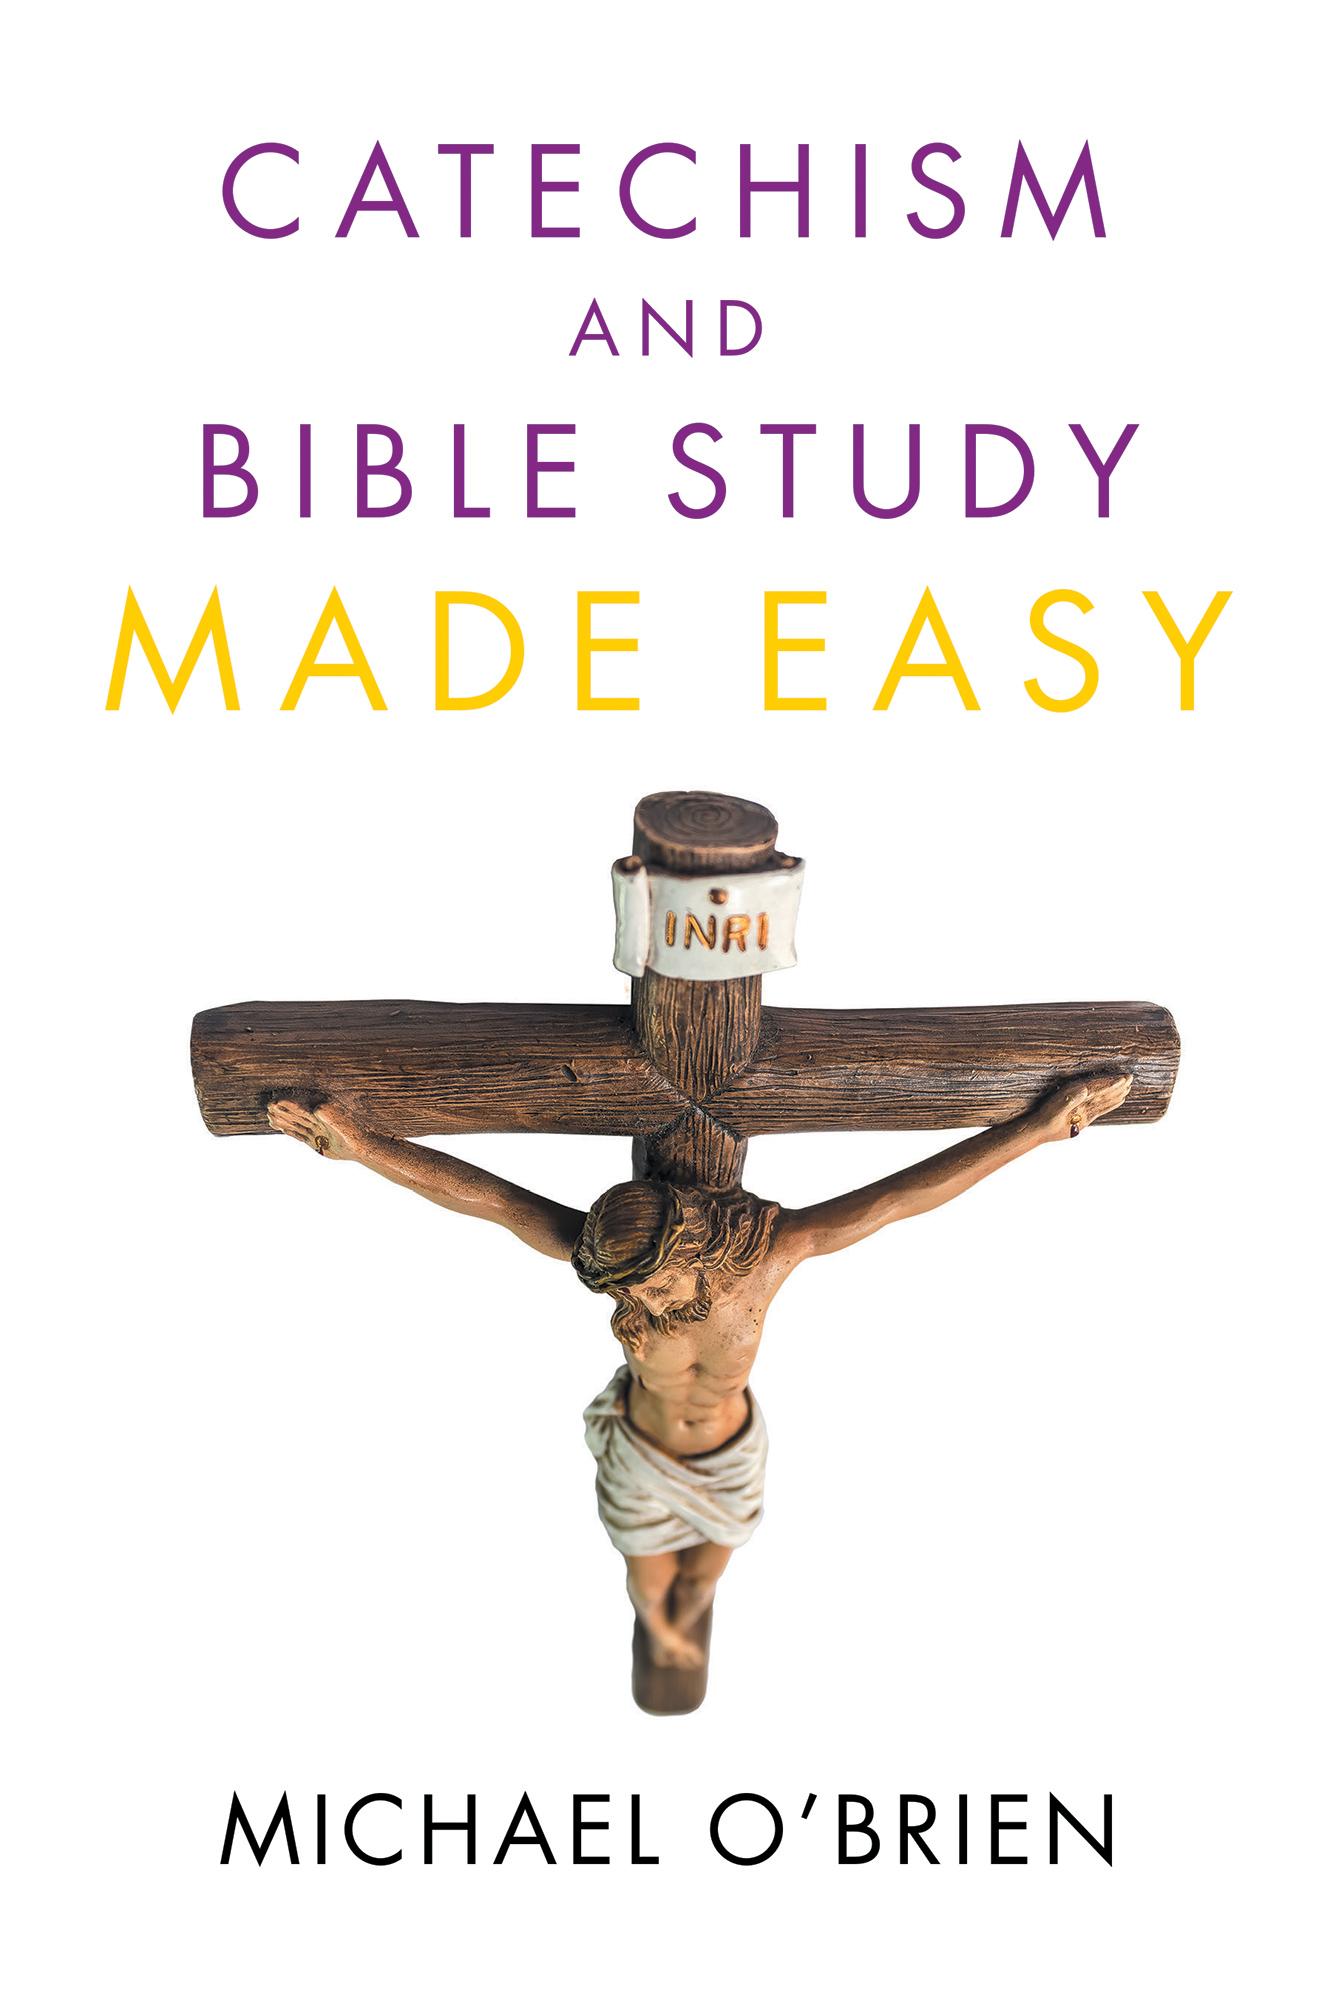 Who wrote the Bible? | Bibleinfo.com